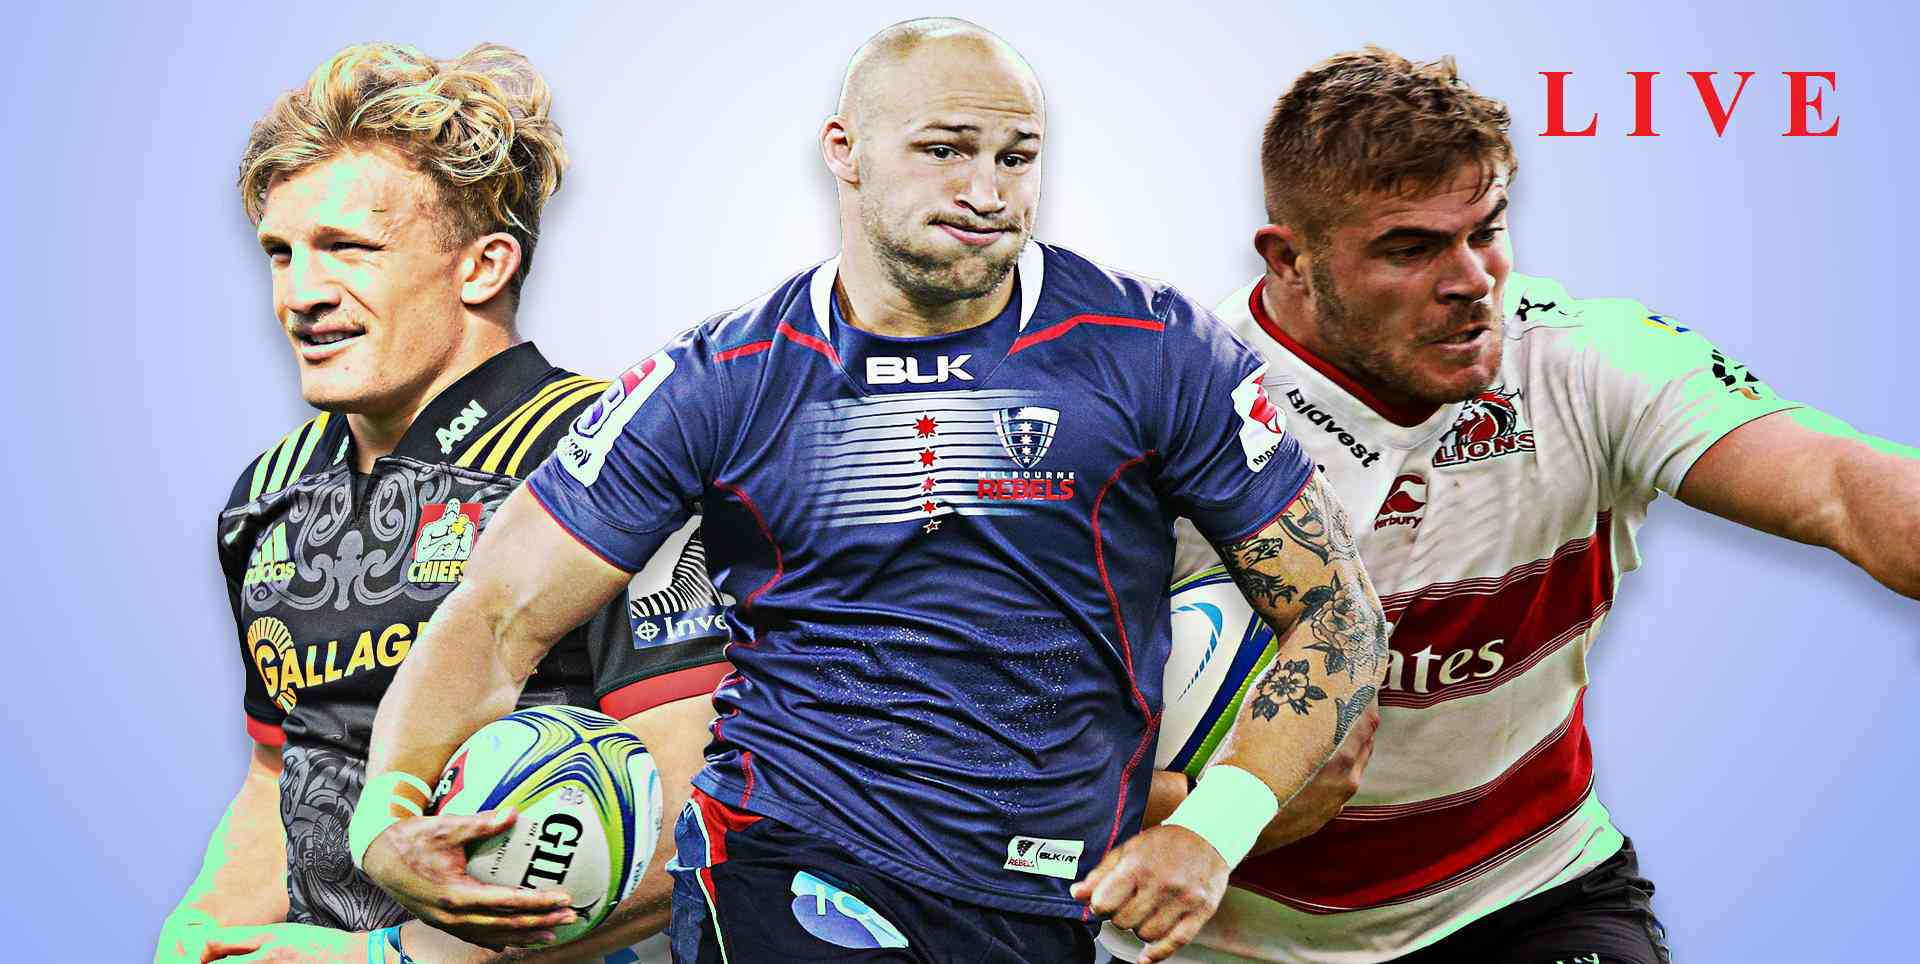 live-france-vs-samoa-rugby-stream